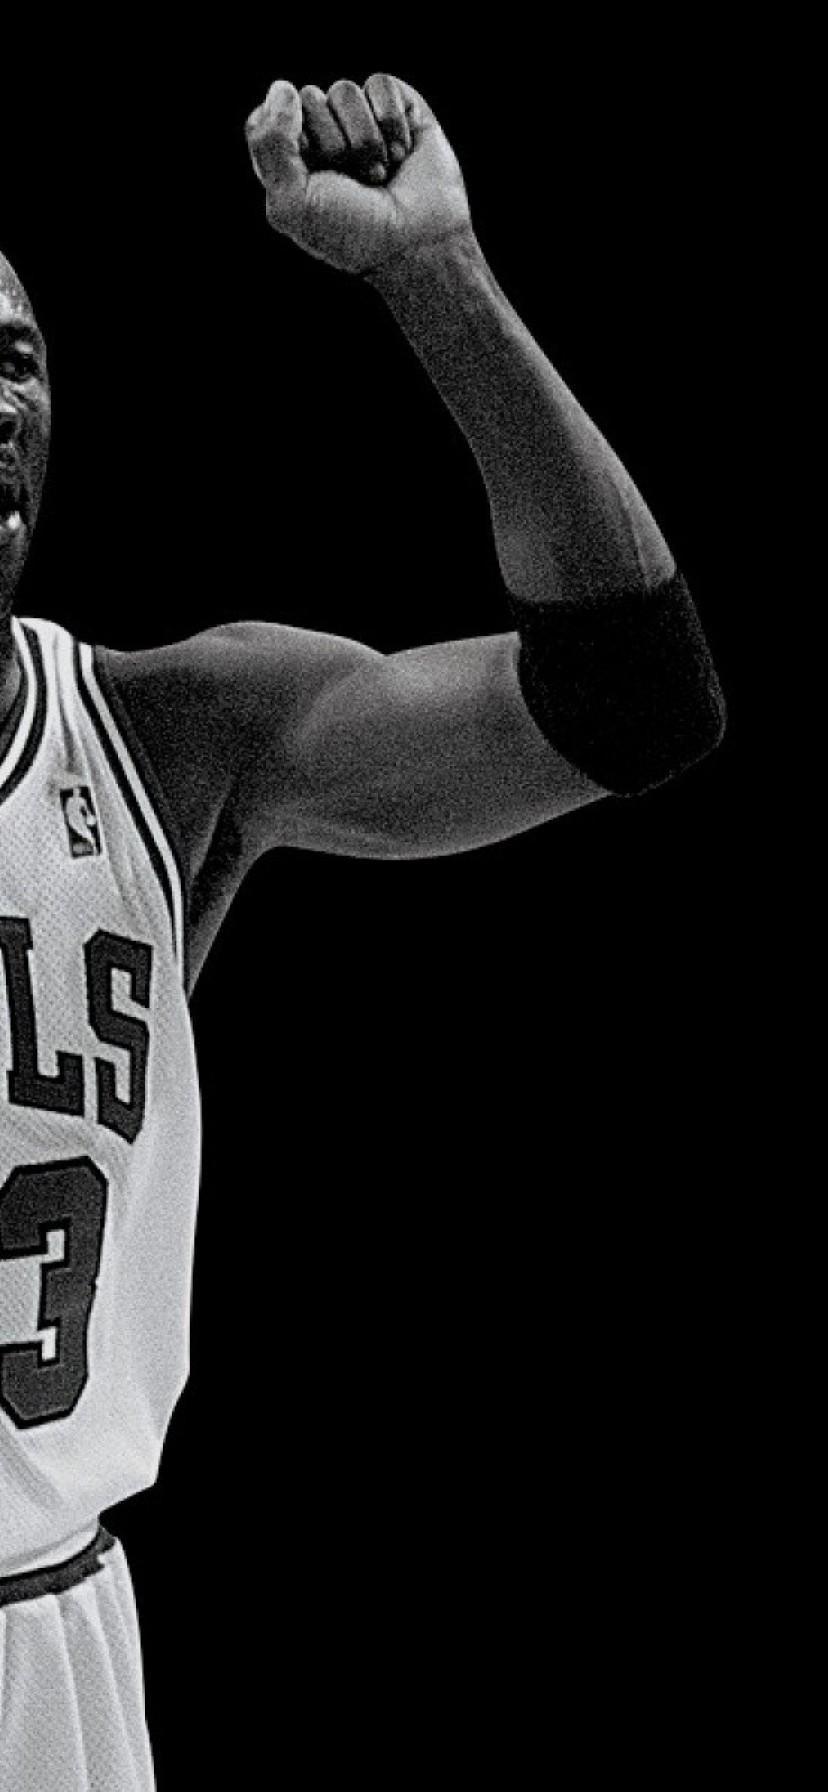 Iphone Xr Michael Jordan Wallpaper - Don T Do Things Half Heartedly , HD Wallpaper & Backgrounds